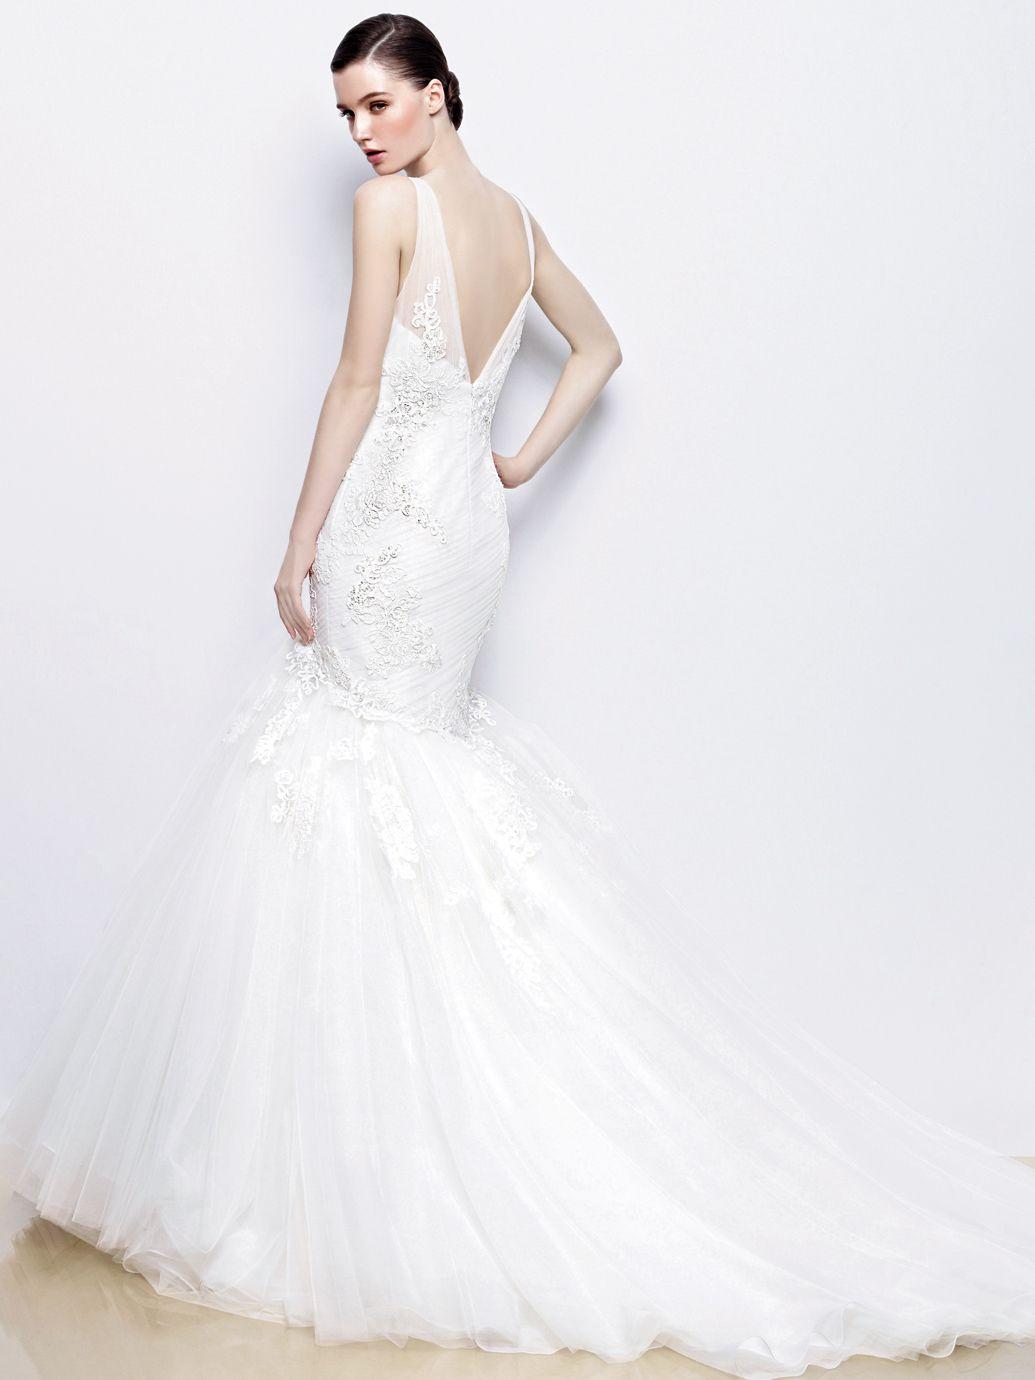 Wedding dresses fresno  Enzoani Irina back view  New Wedding Gowns  Pinterest  Enzoani